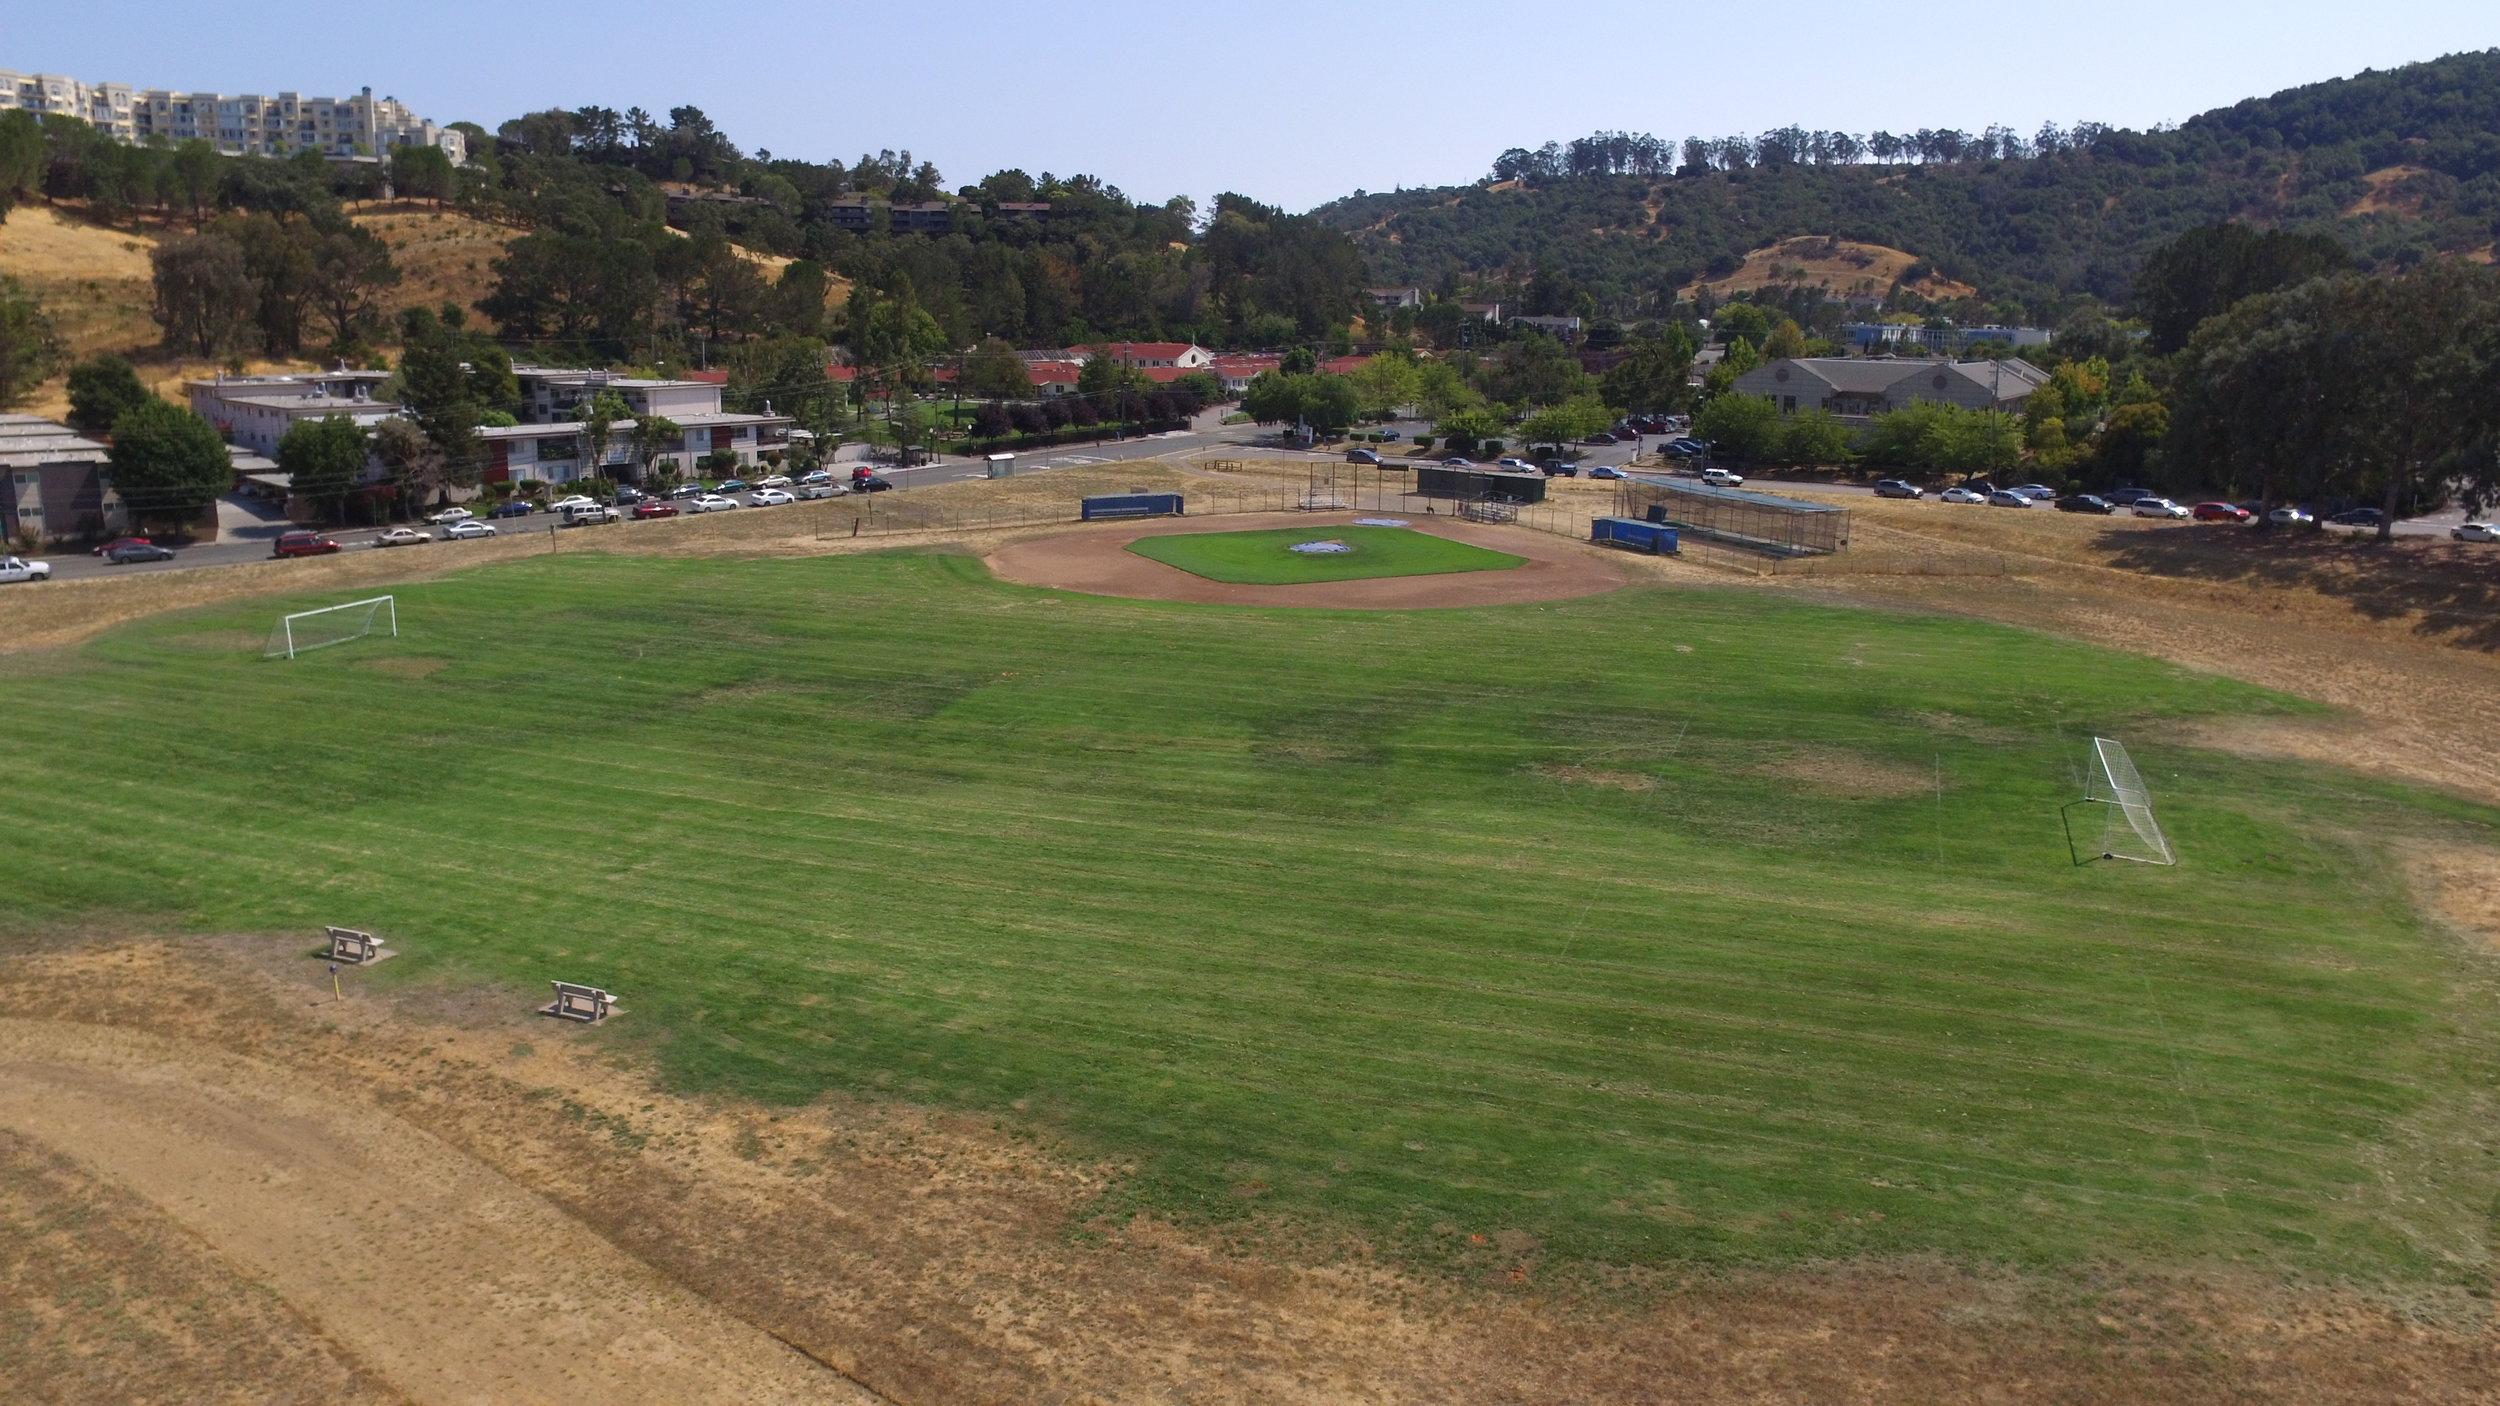 Vallecito Elementary School—Field #1 (Glenn Cooper Field)